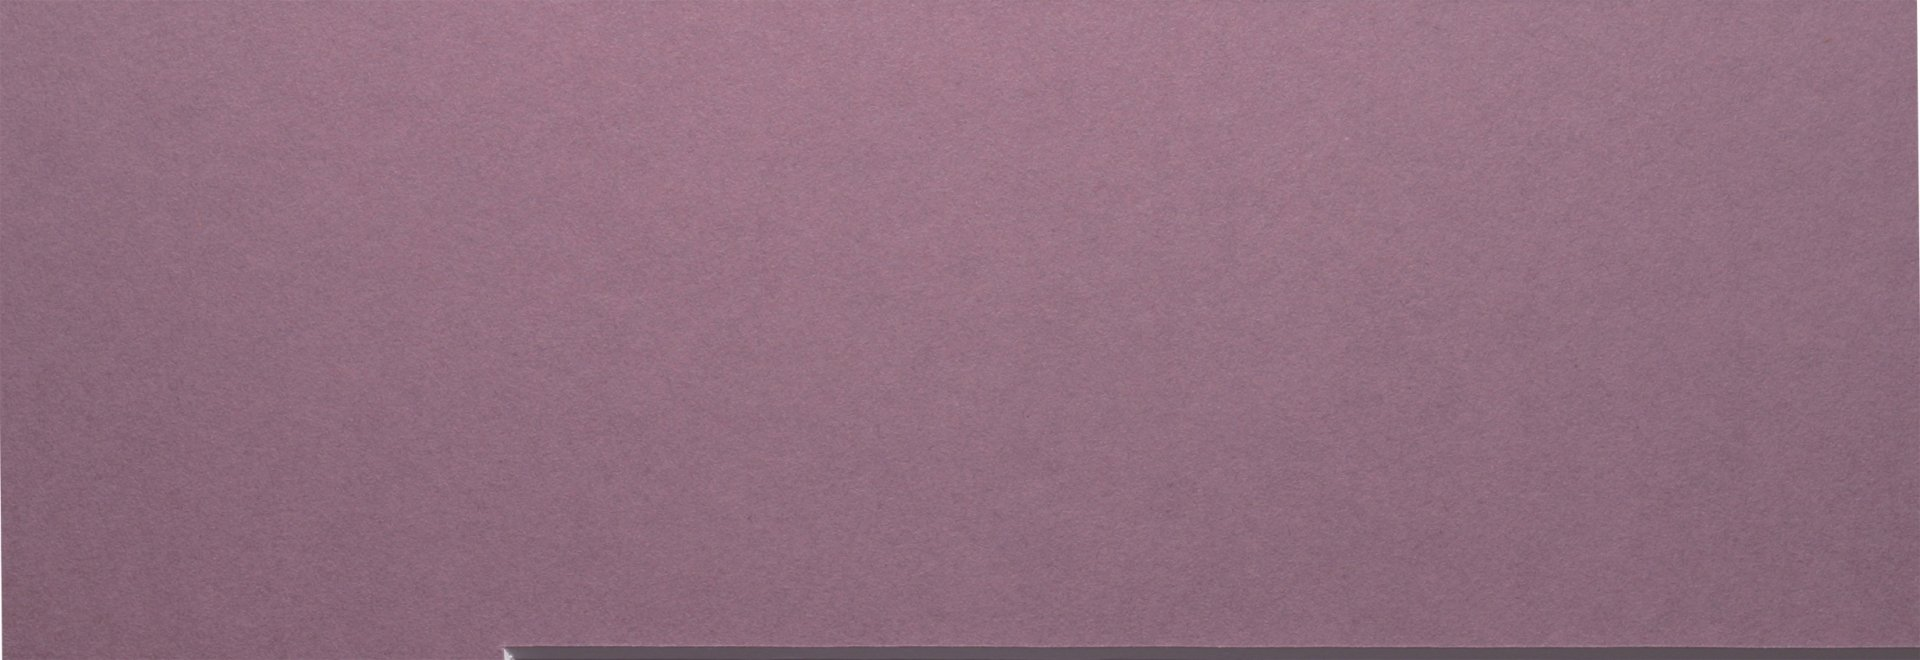 SRM 1015 Grey Violet